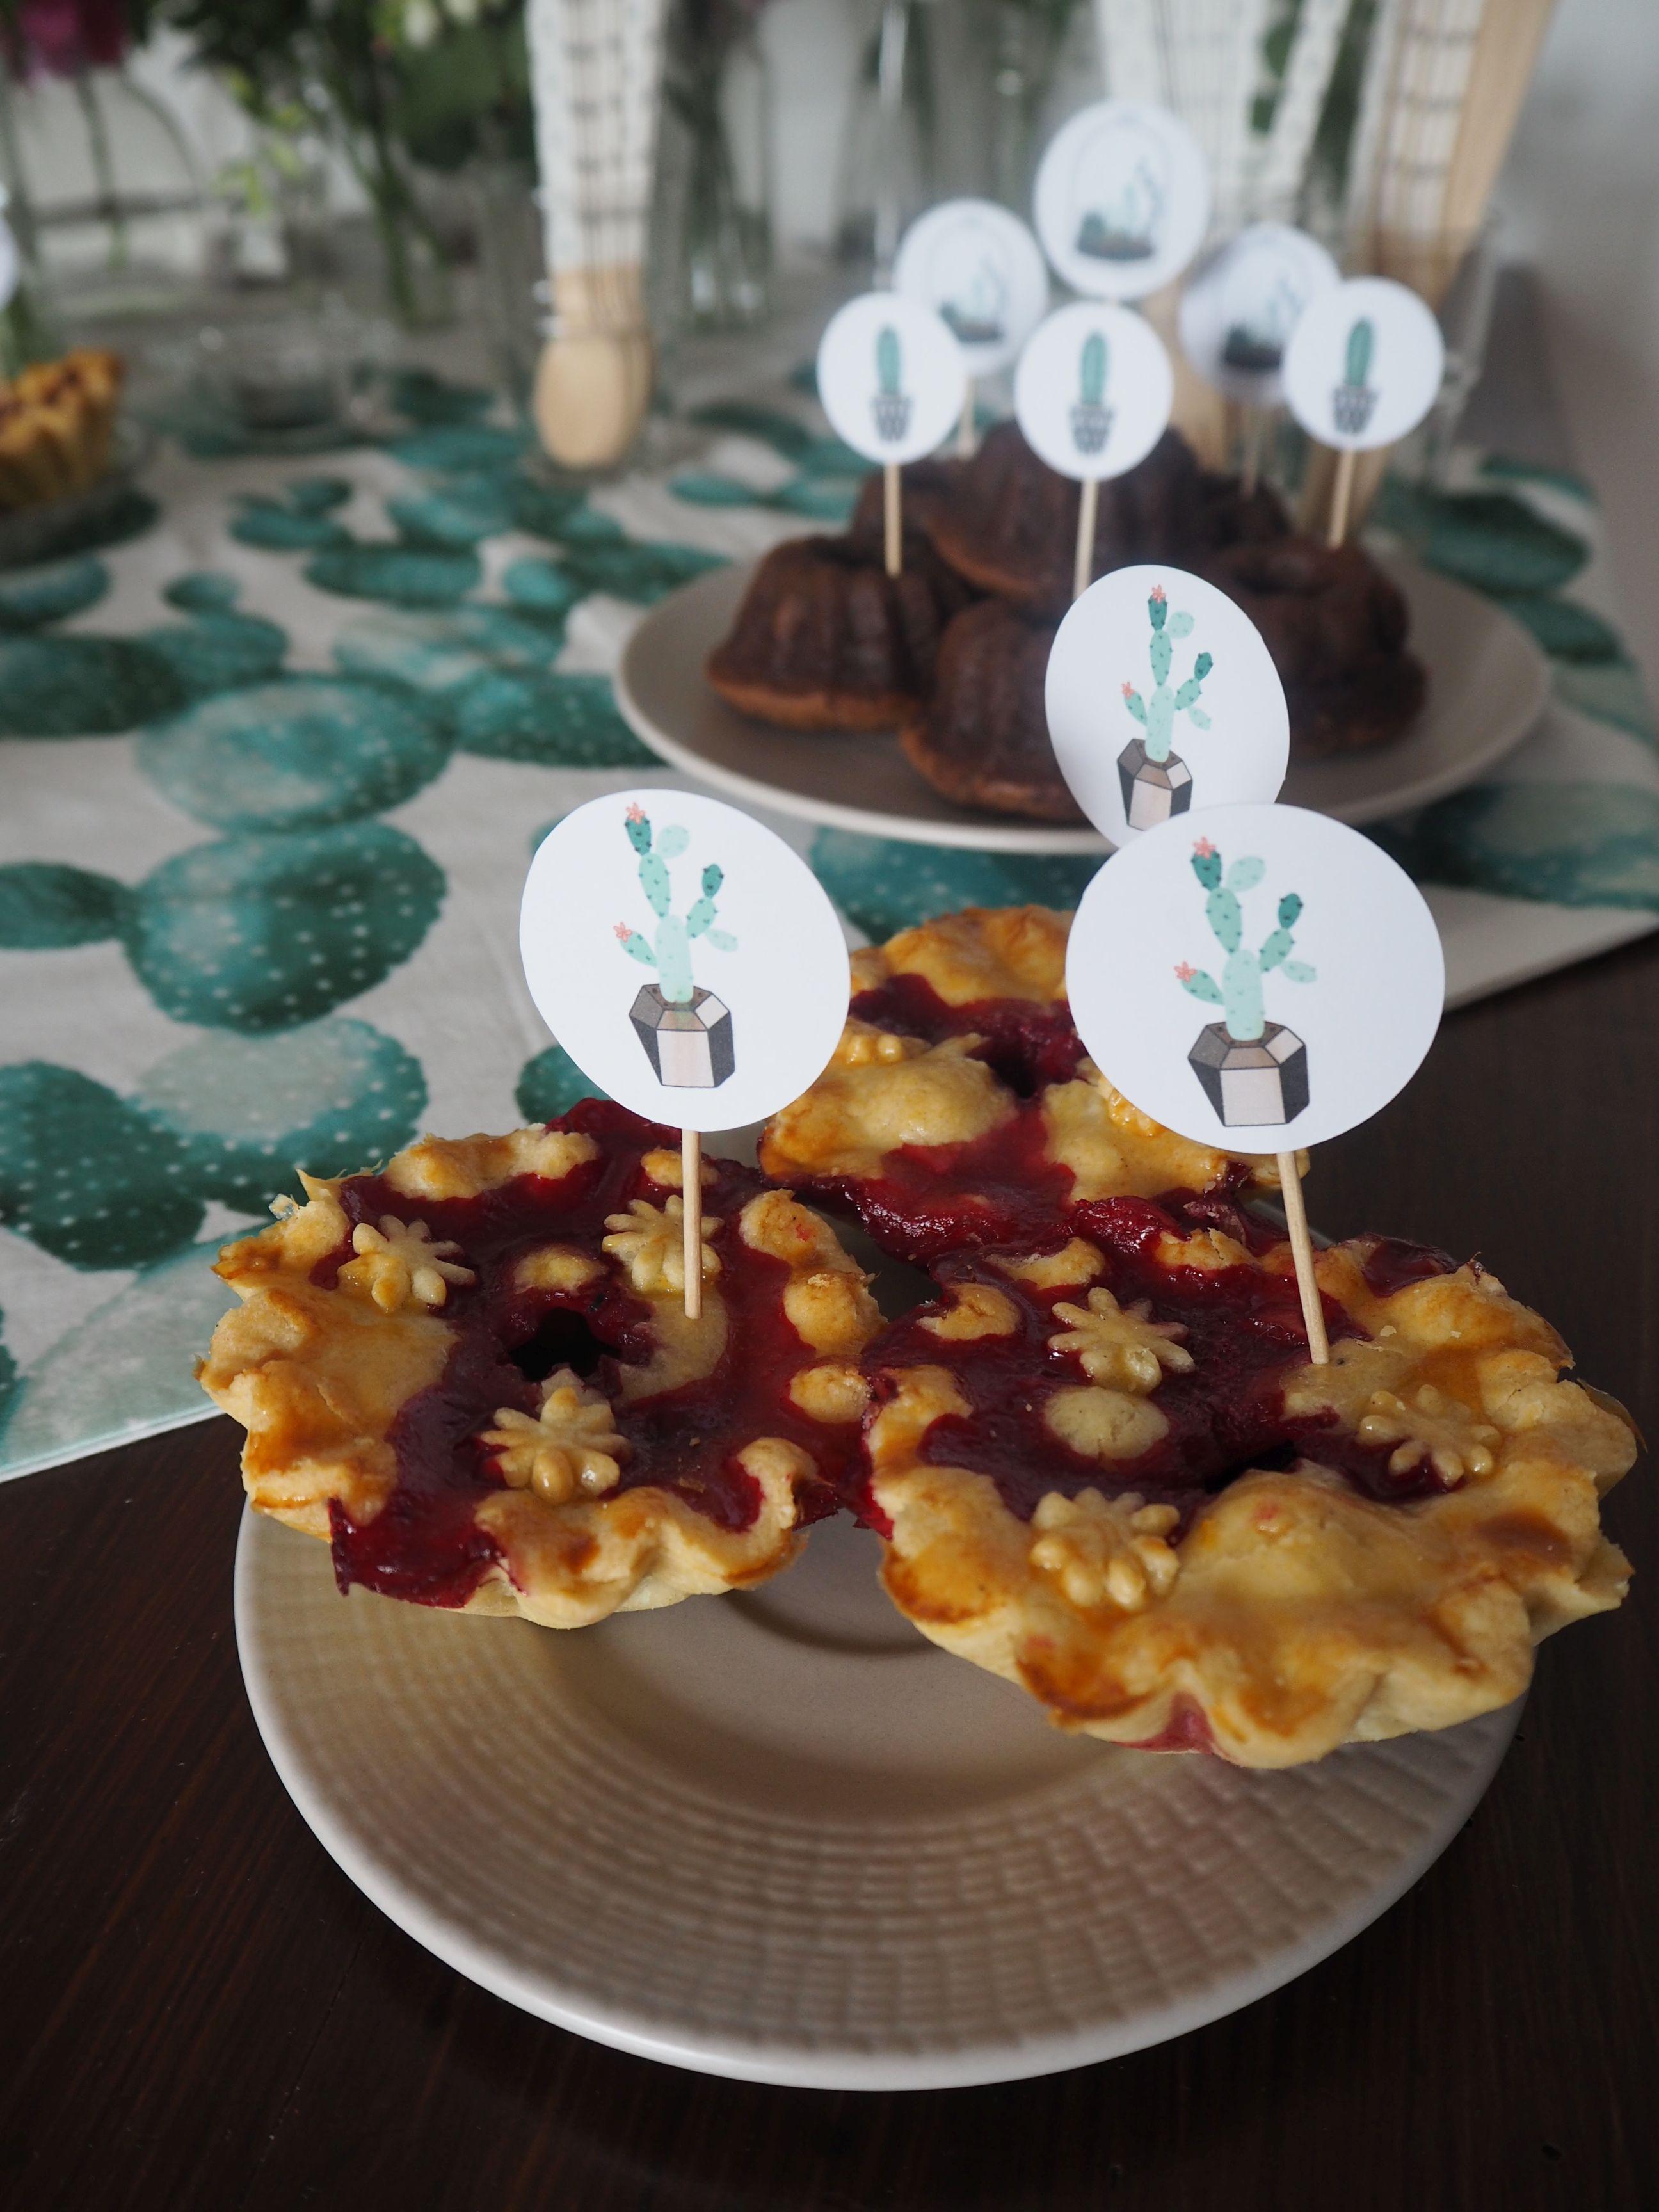 2016-08-summer-succulents-party-recipes-berries (1)